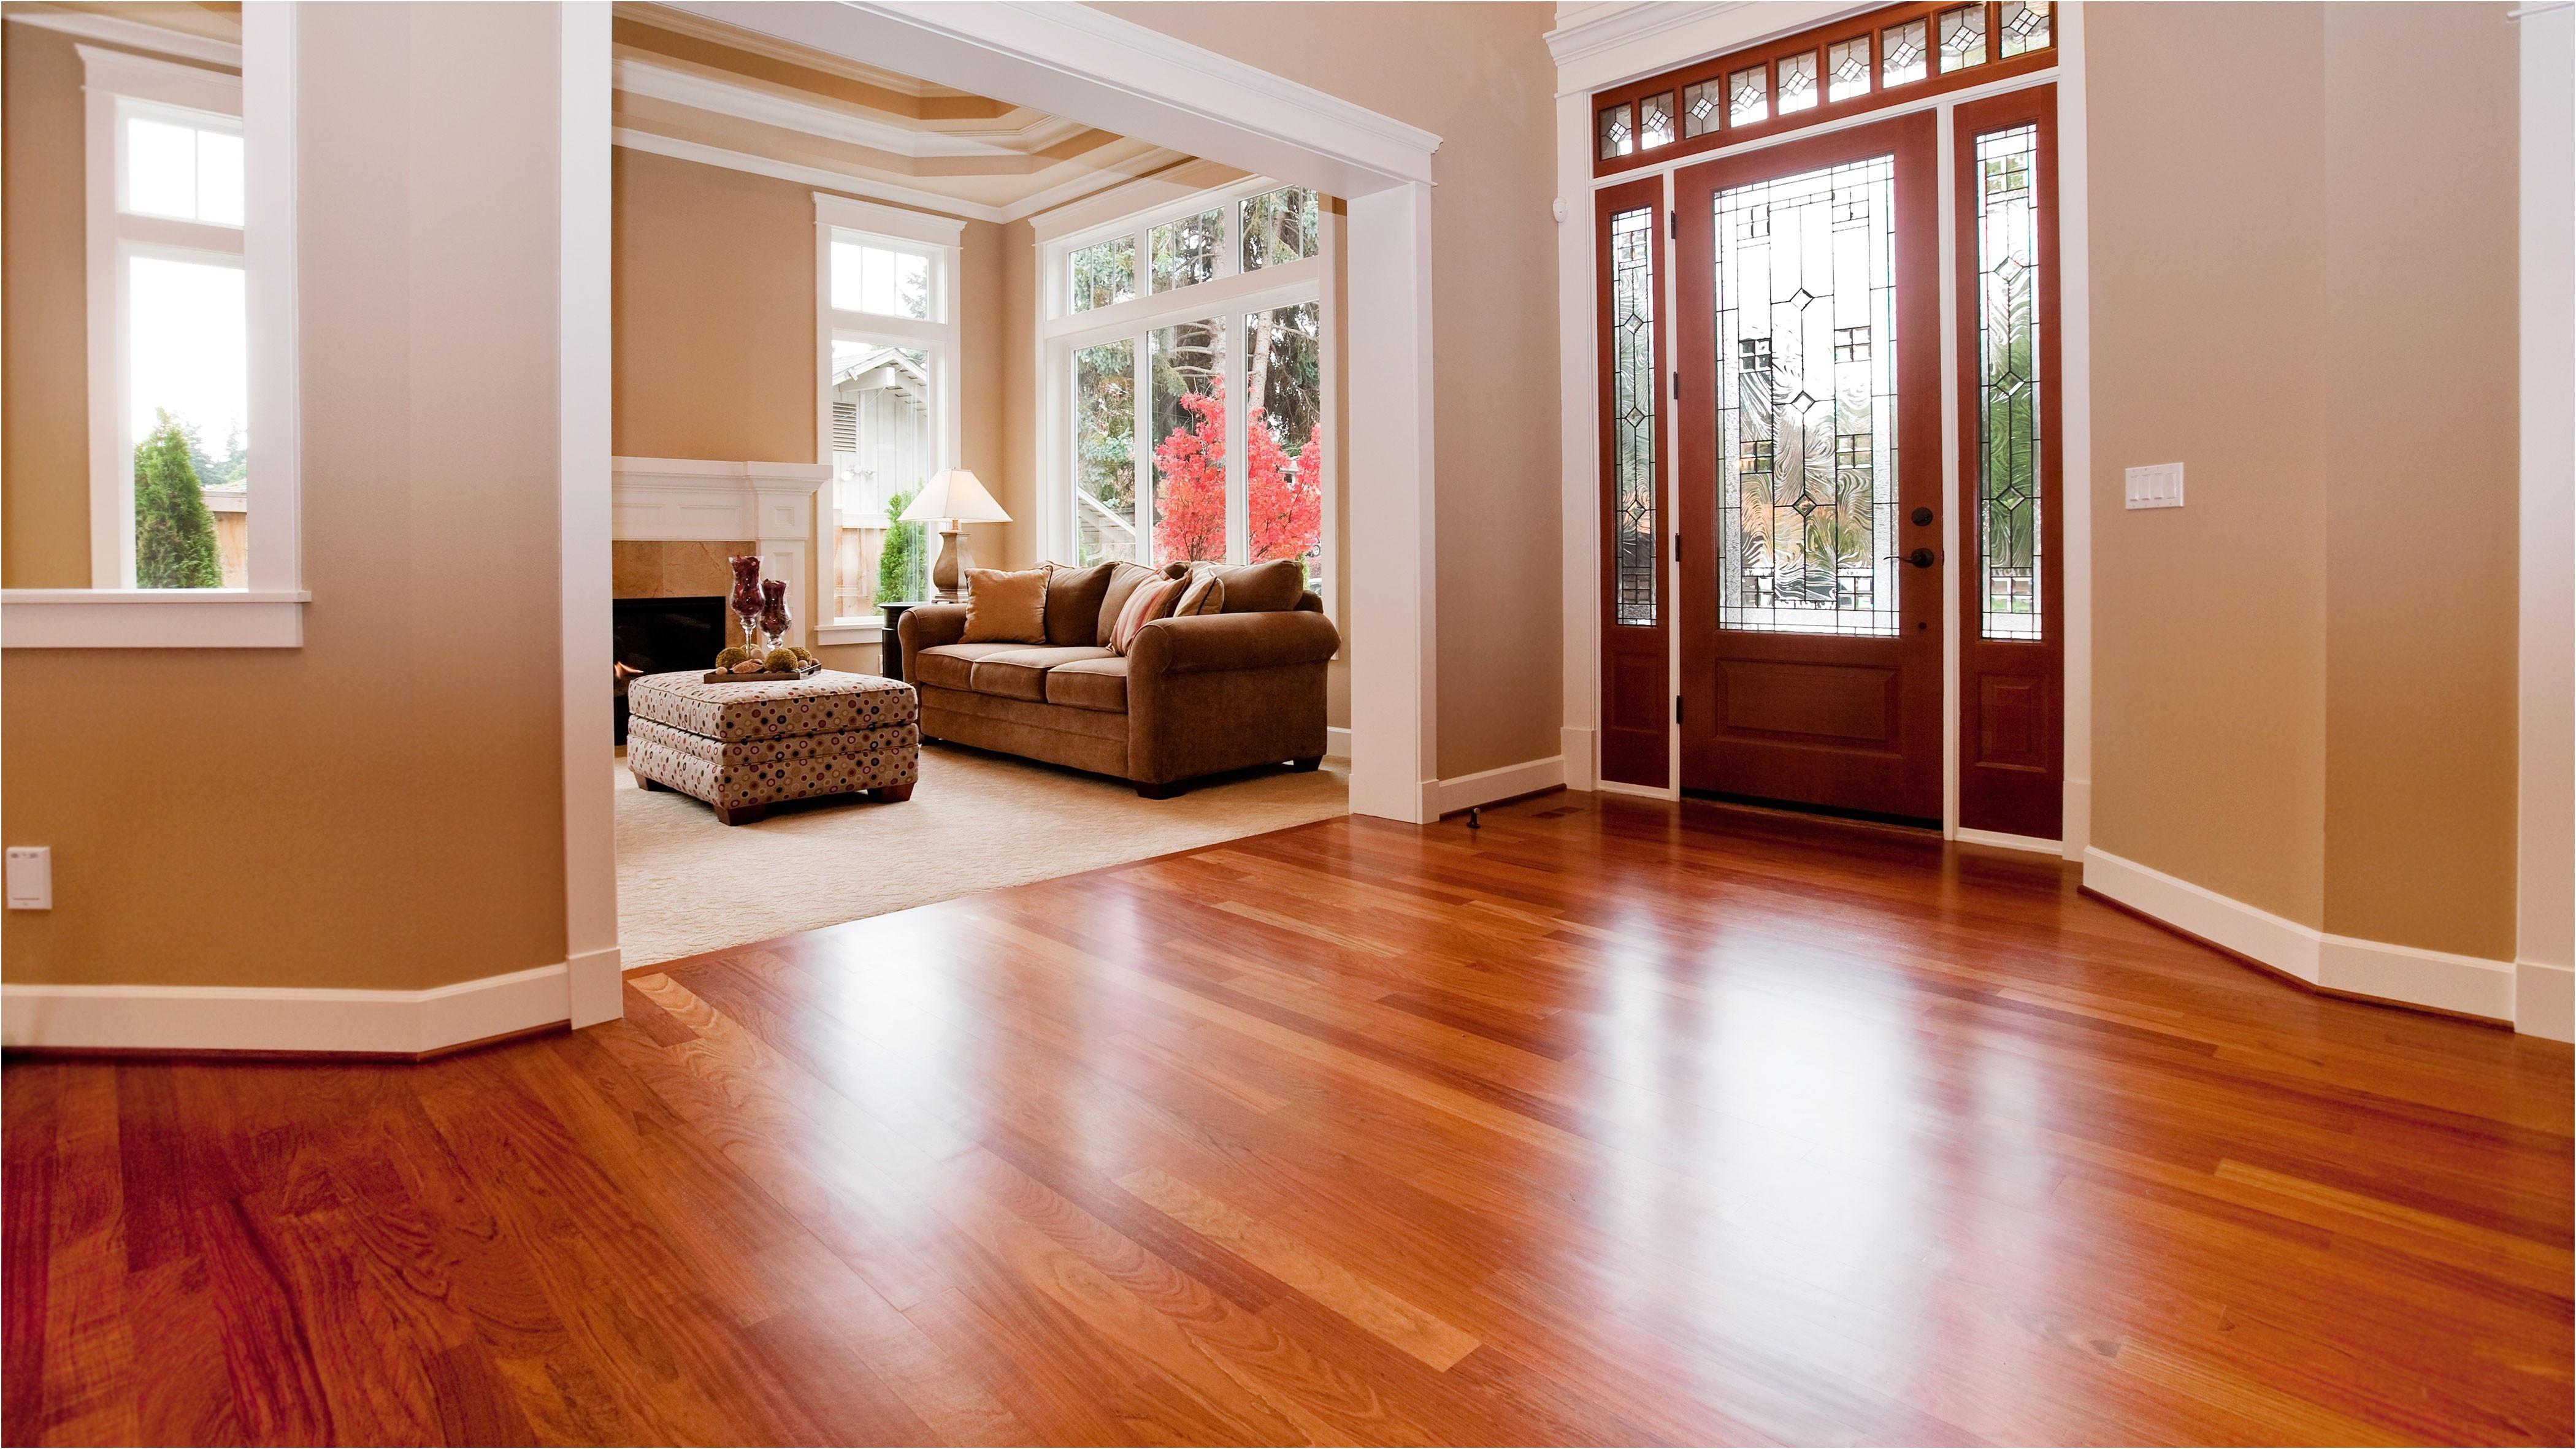 refinish hardwood floors san jose of handyman to lay laminate flooring flooring design for handyman to lay laminate flooring elegant best hardwood floor cleaner elegant floor a close up shot